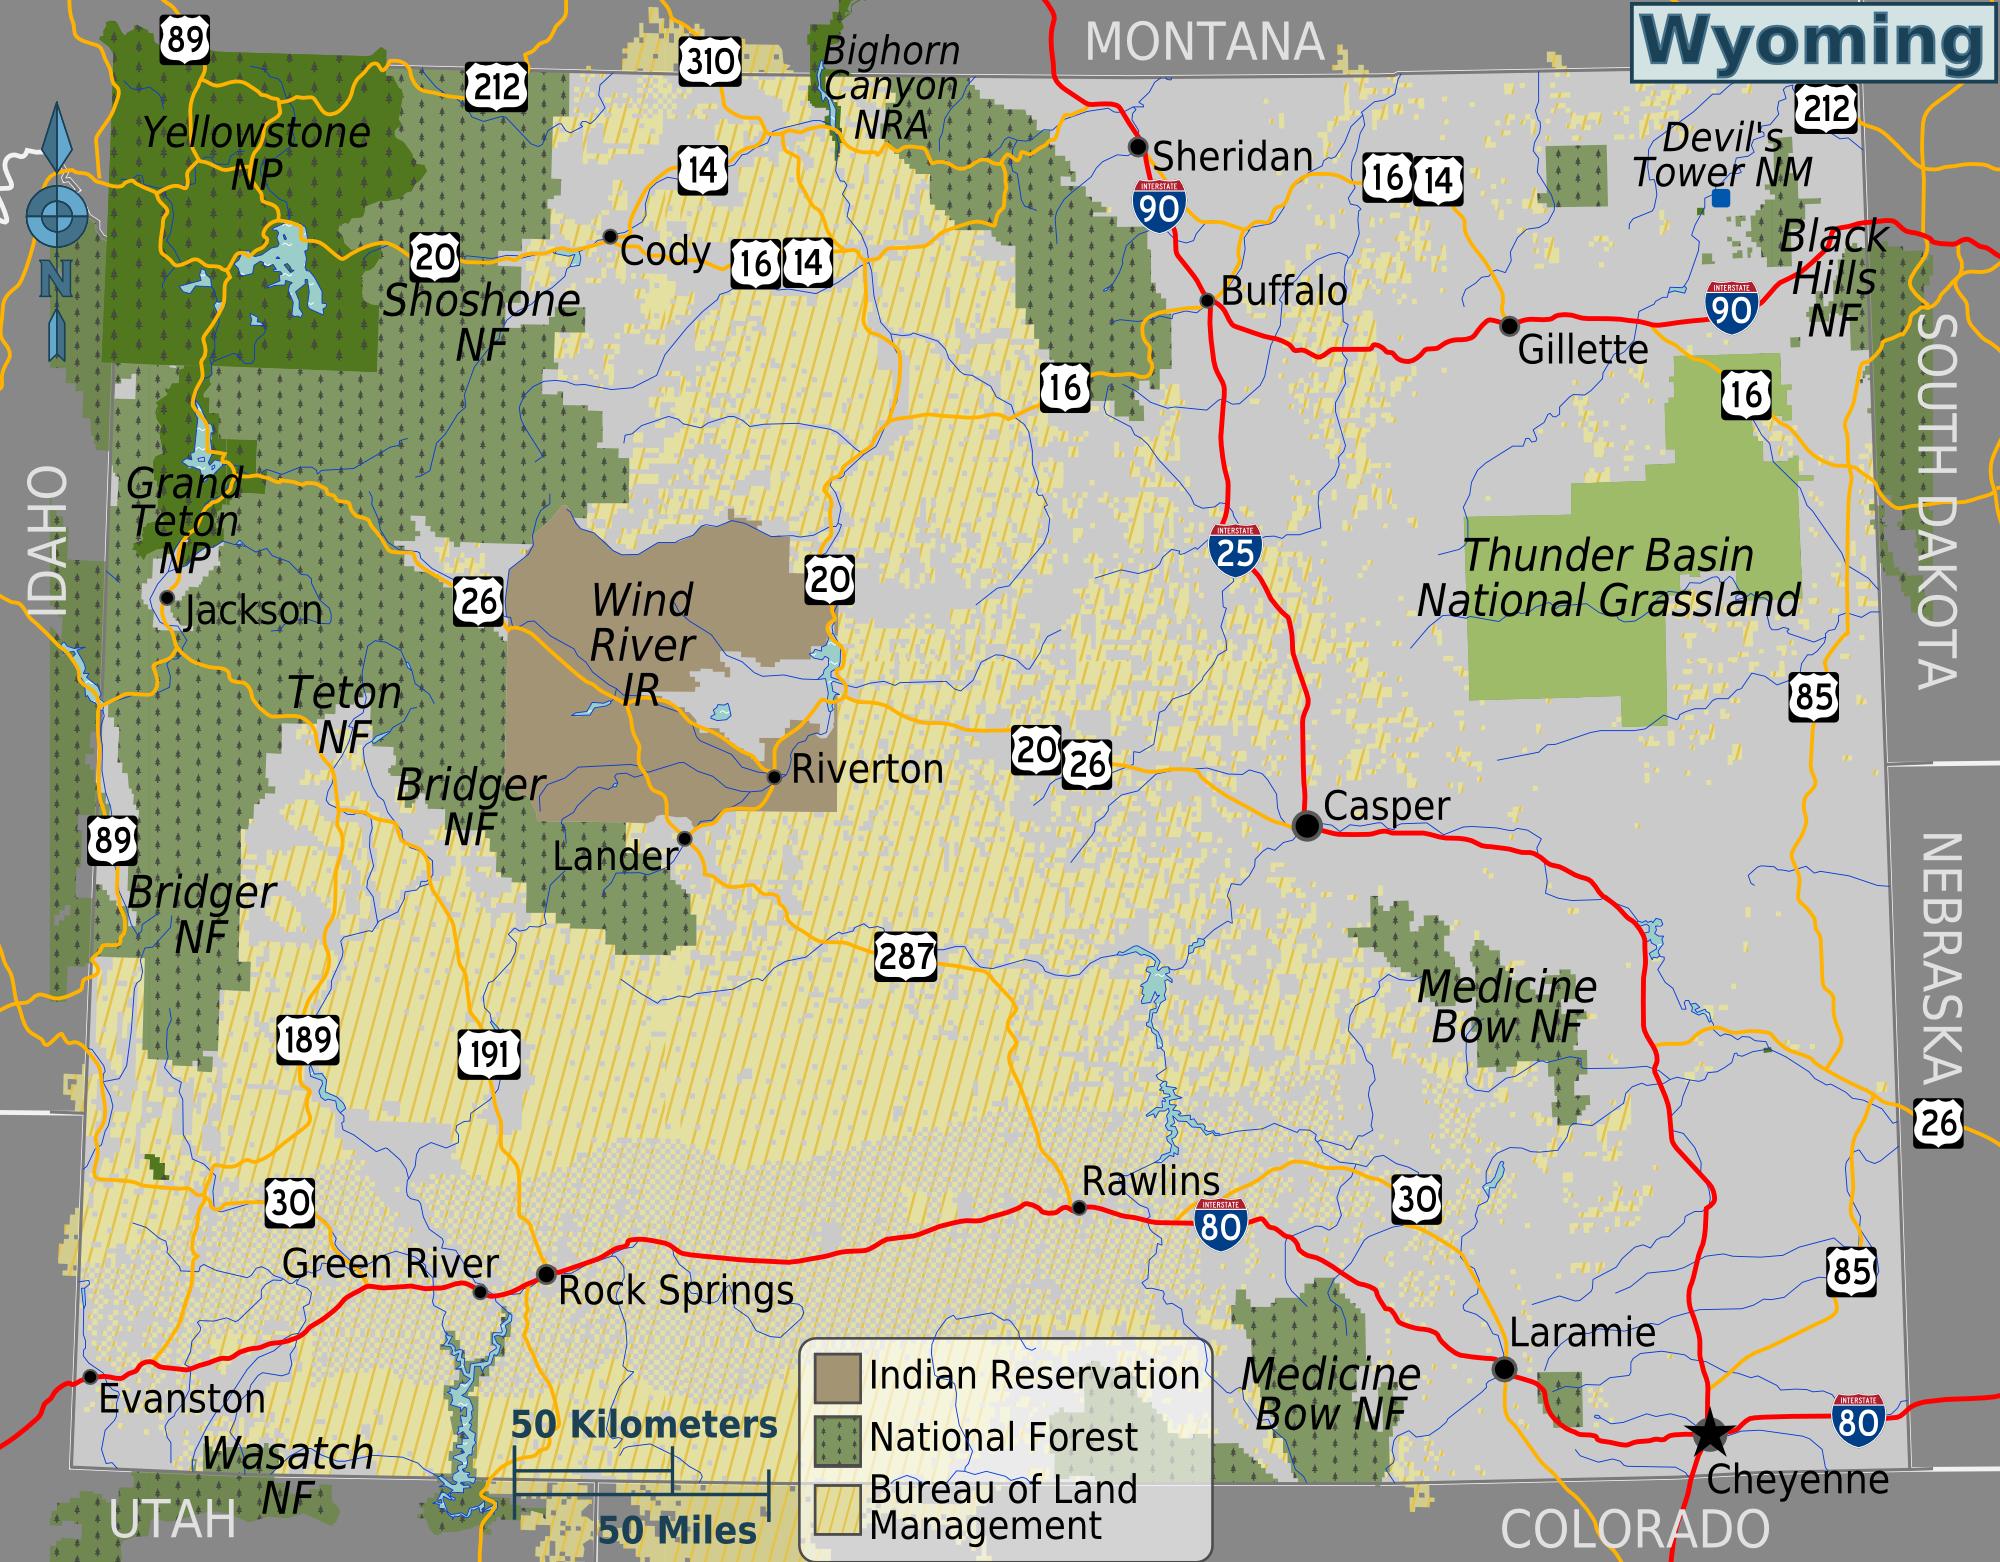 Wyoming Public Land Map DOI Leaked Strategic Plan Re Affirms Energy Priorities   Wyoming